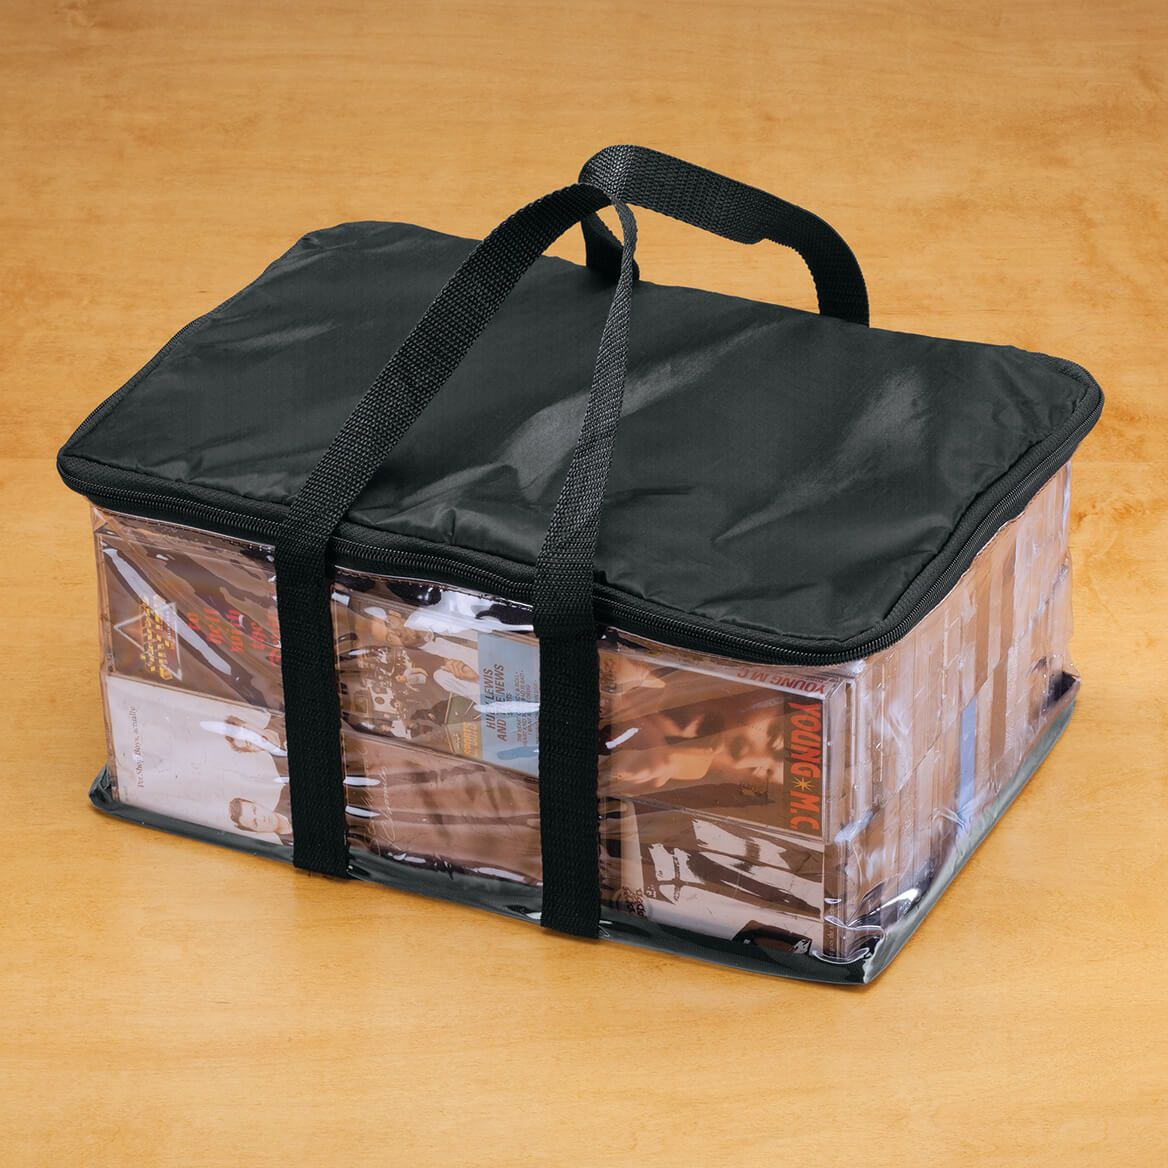 Cassette Tapes Storage Case-344902